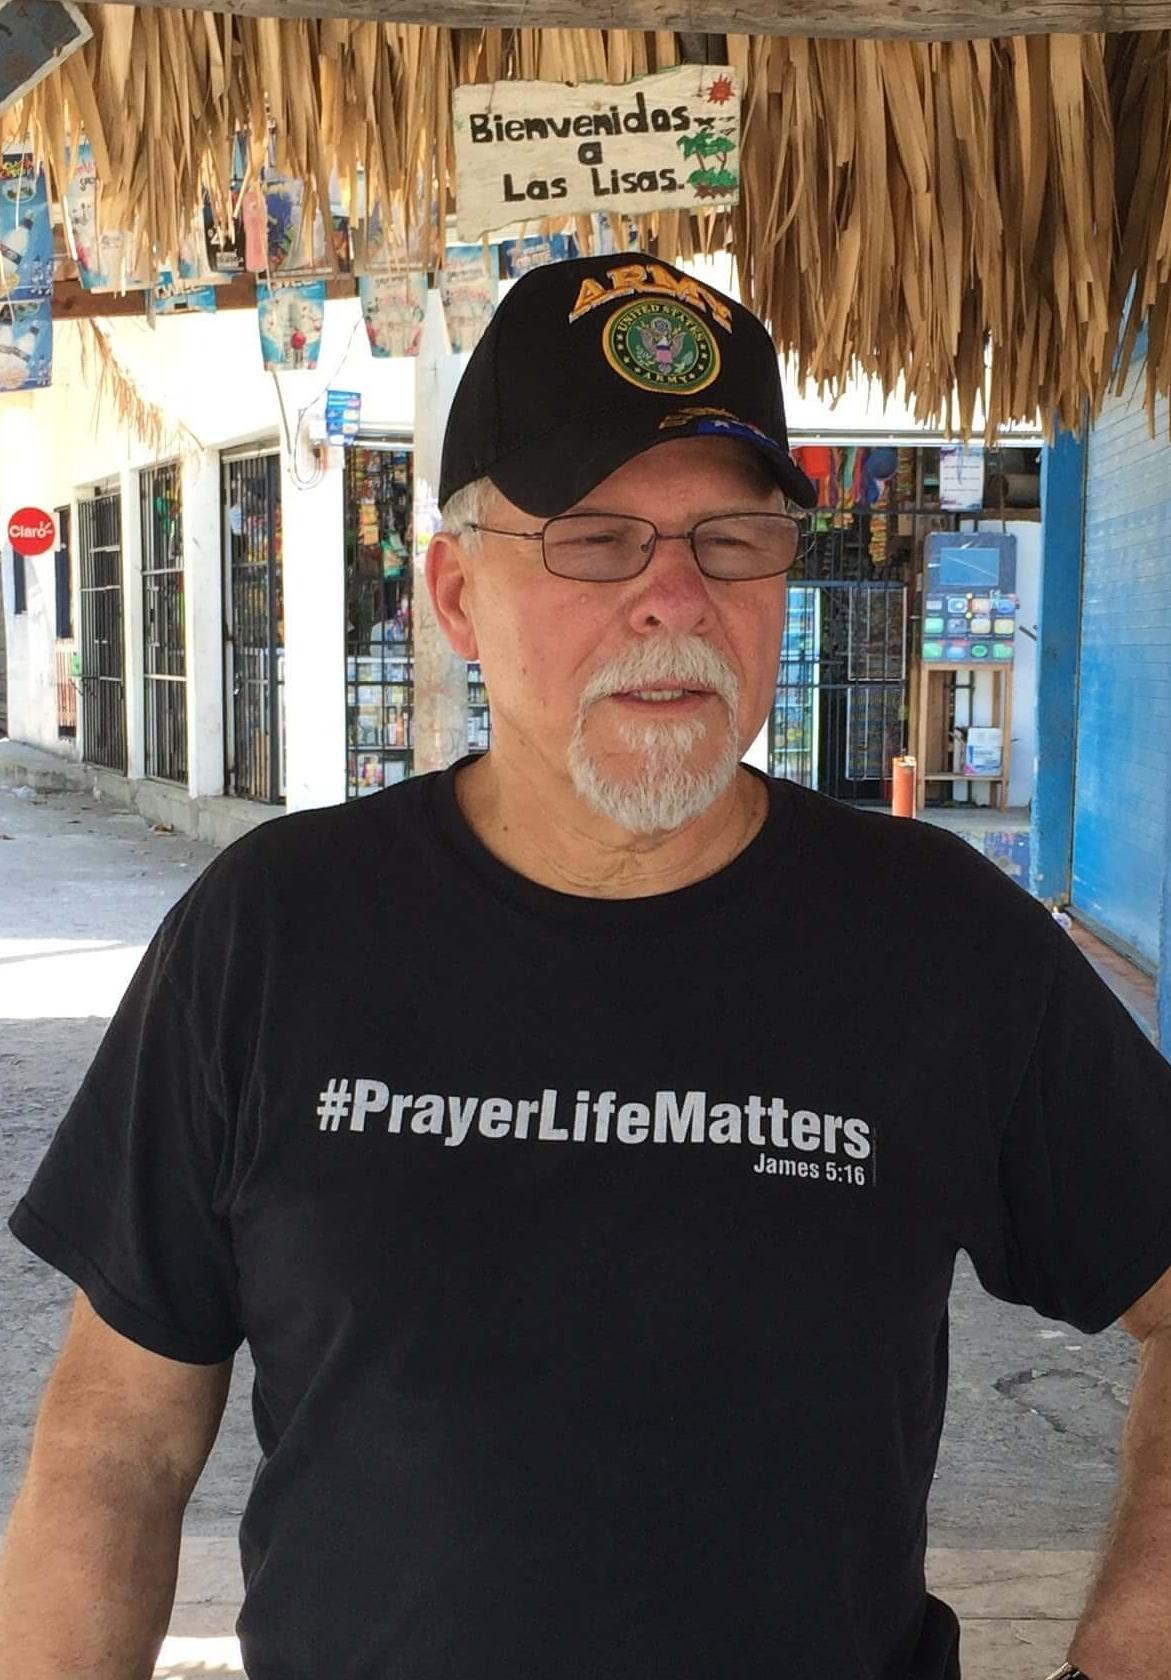 Ray Gurney talks about his trash idea while walking through a beach community in Las Lisas, Guatemala.